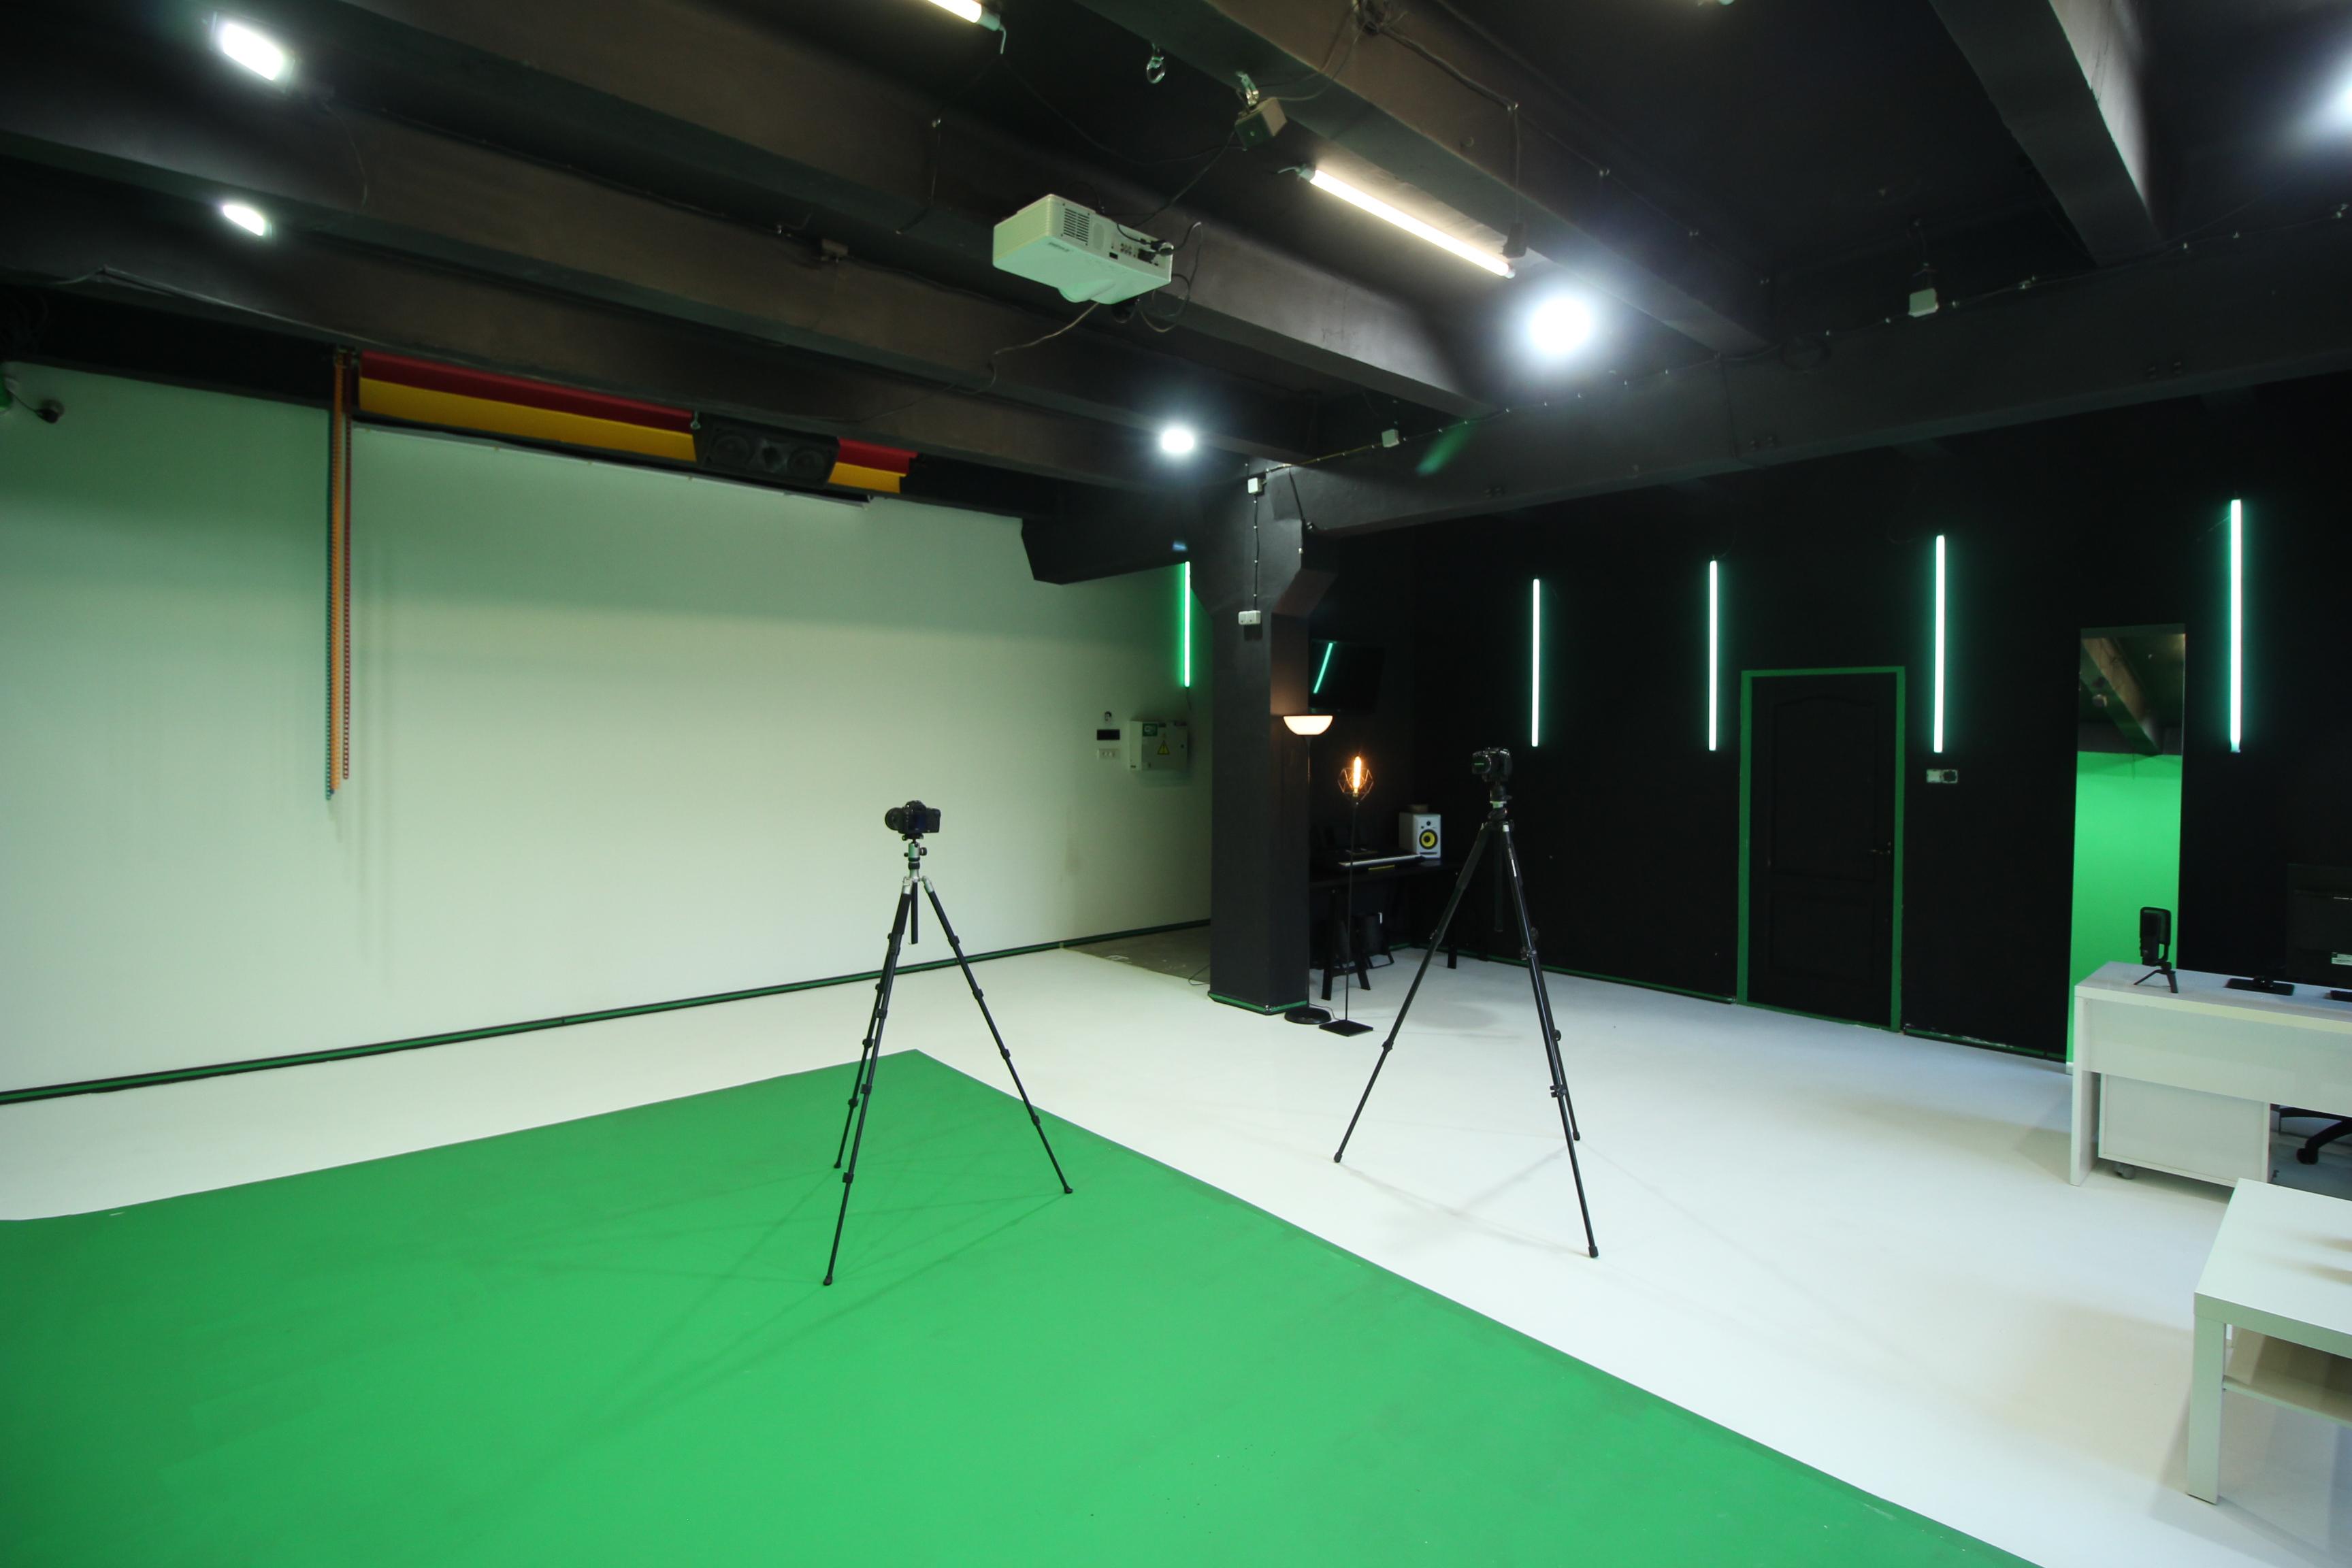 chromakey green screen studio